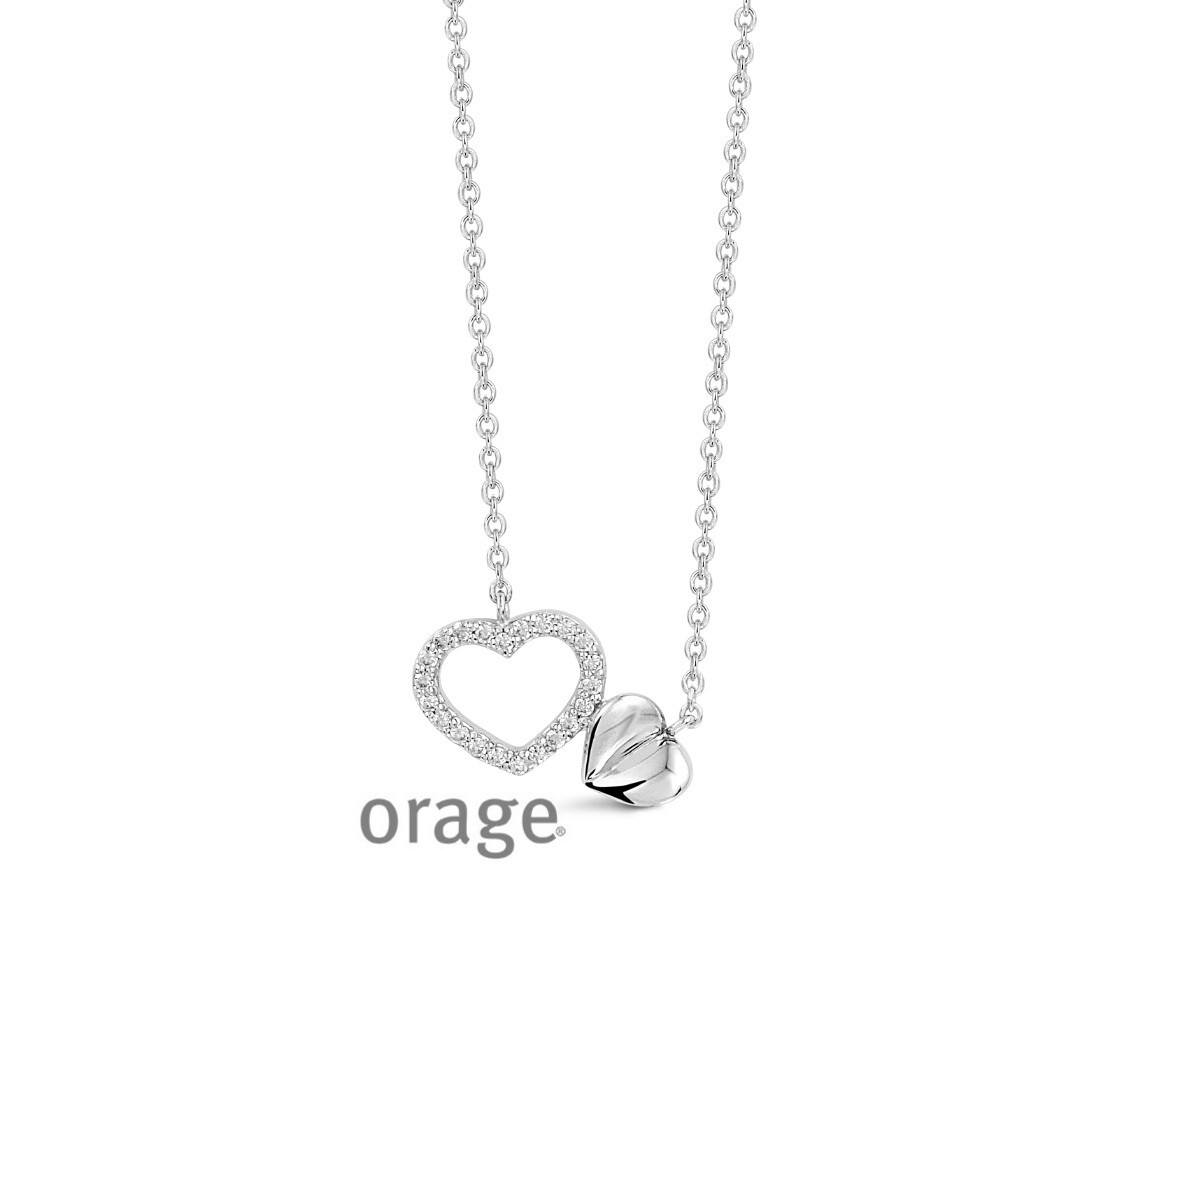 Collier Orage V1434